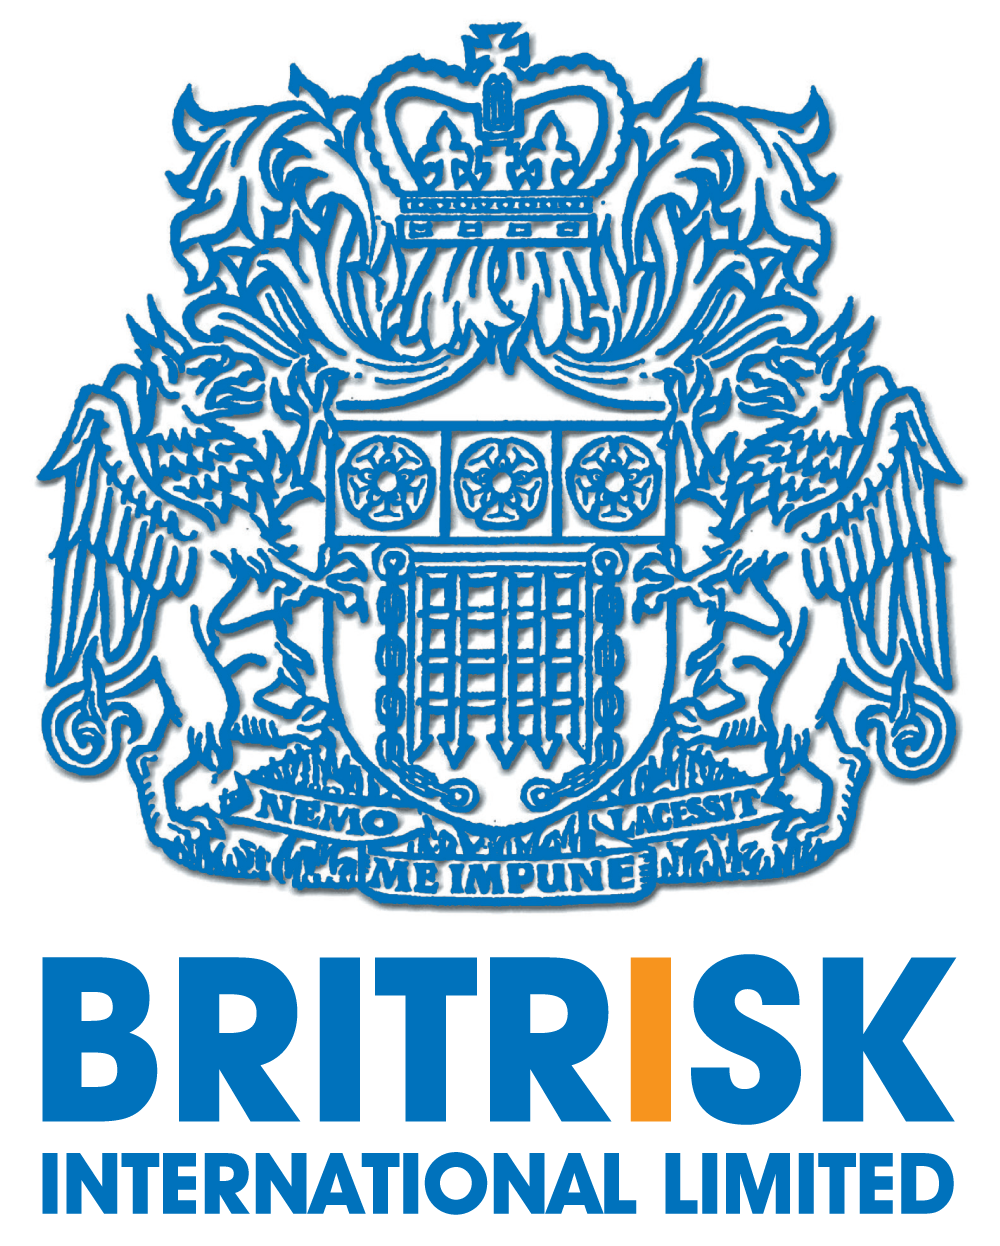 BRITRISK INTERNATIONAL